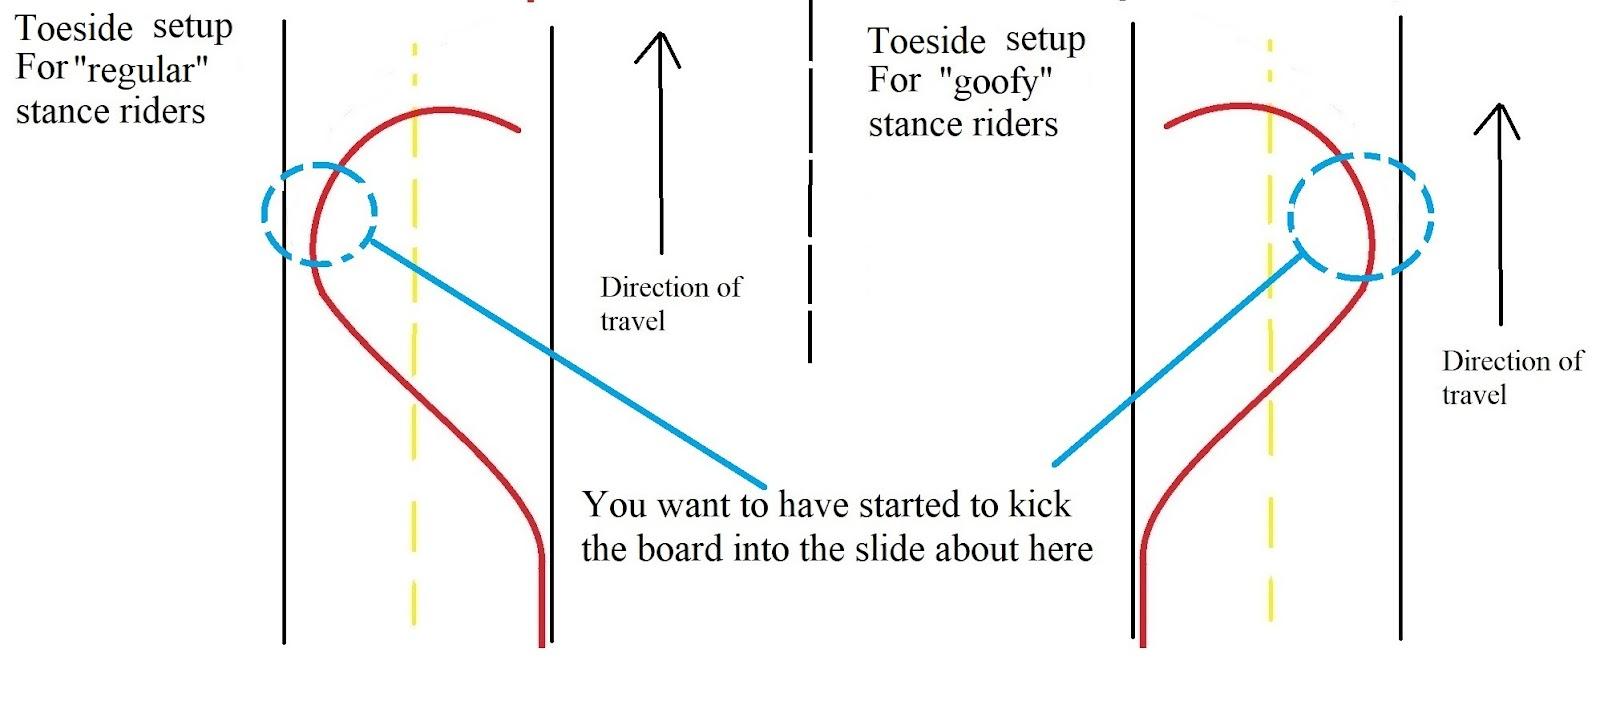 toeside setup carve step 2.1